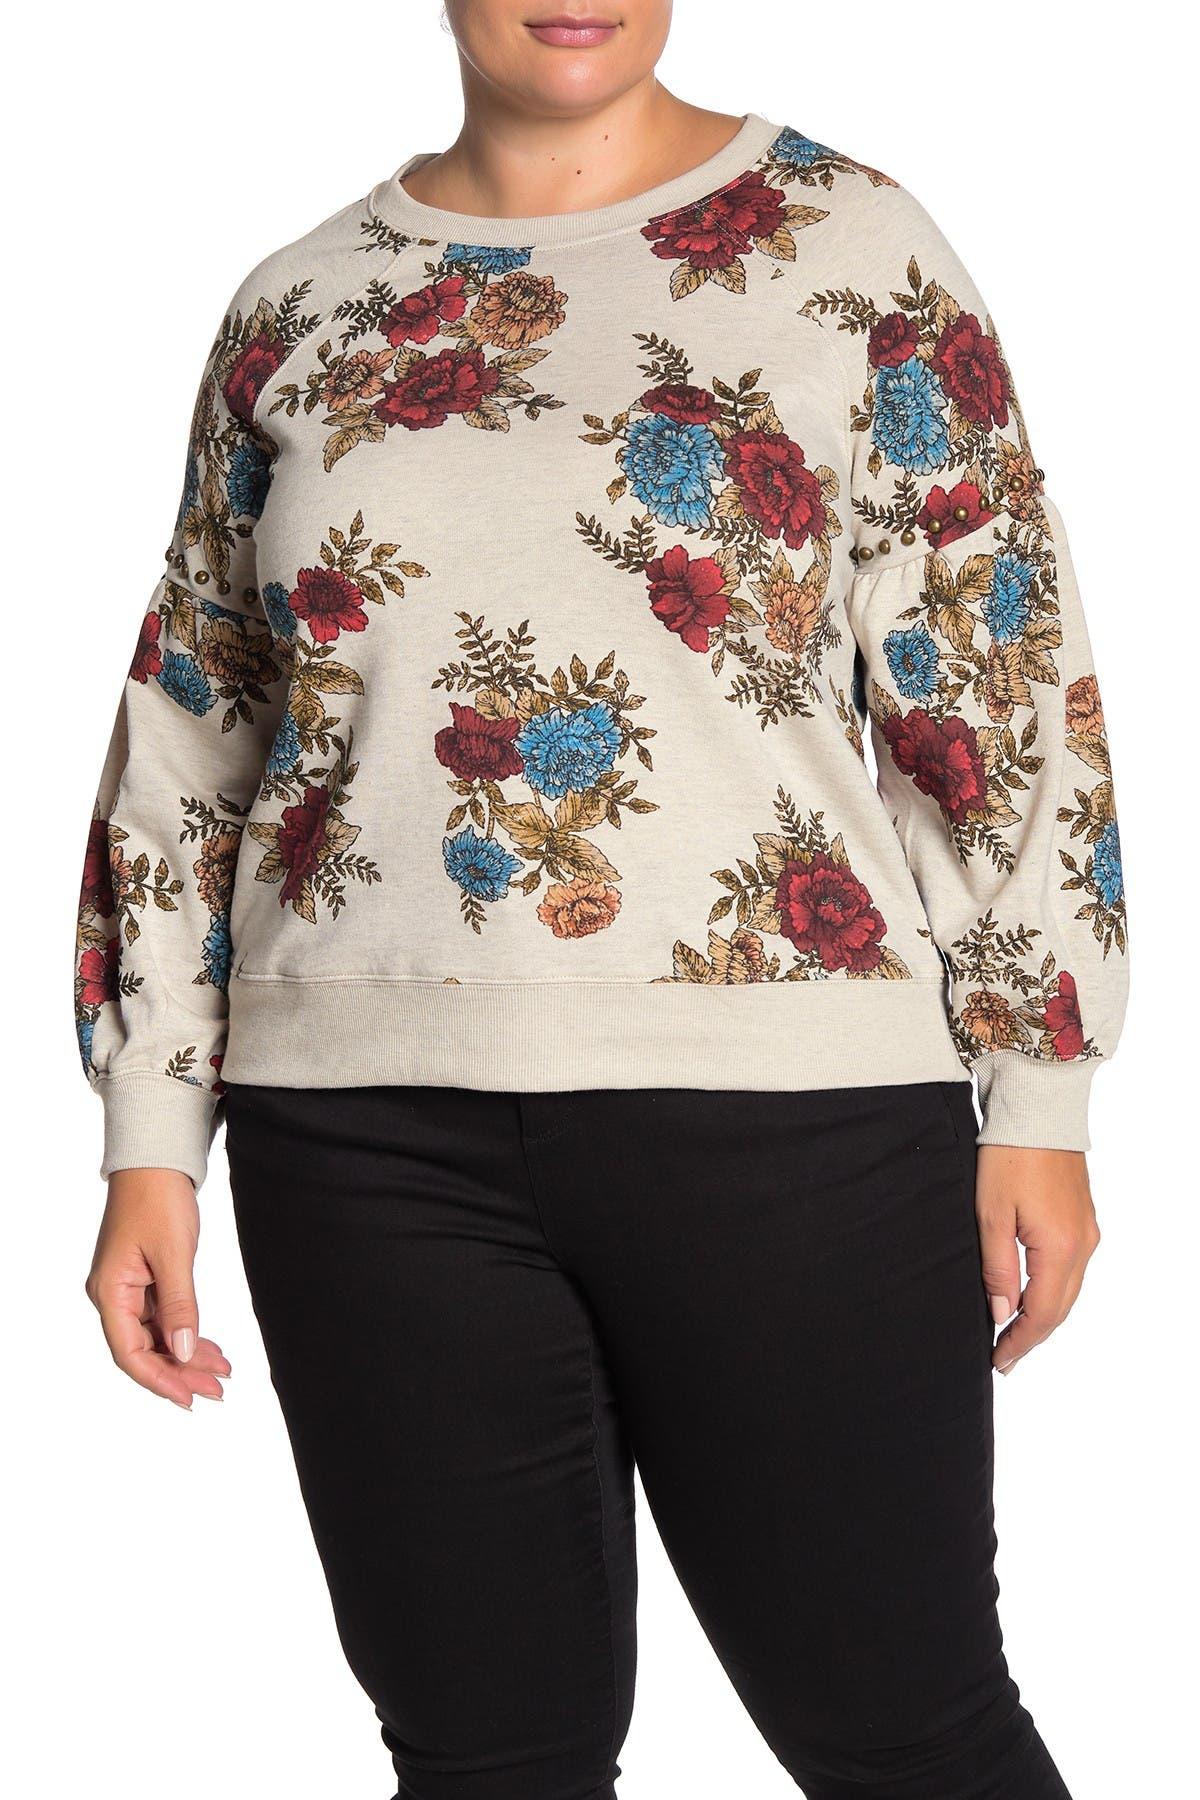 Image of Democracy Floral Print Embellished Stud Sweatshirt